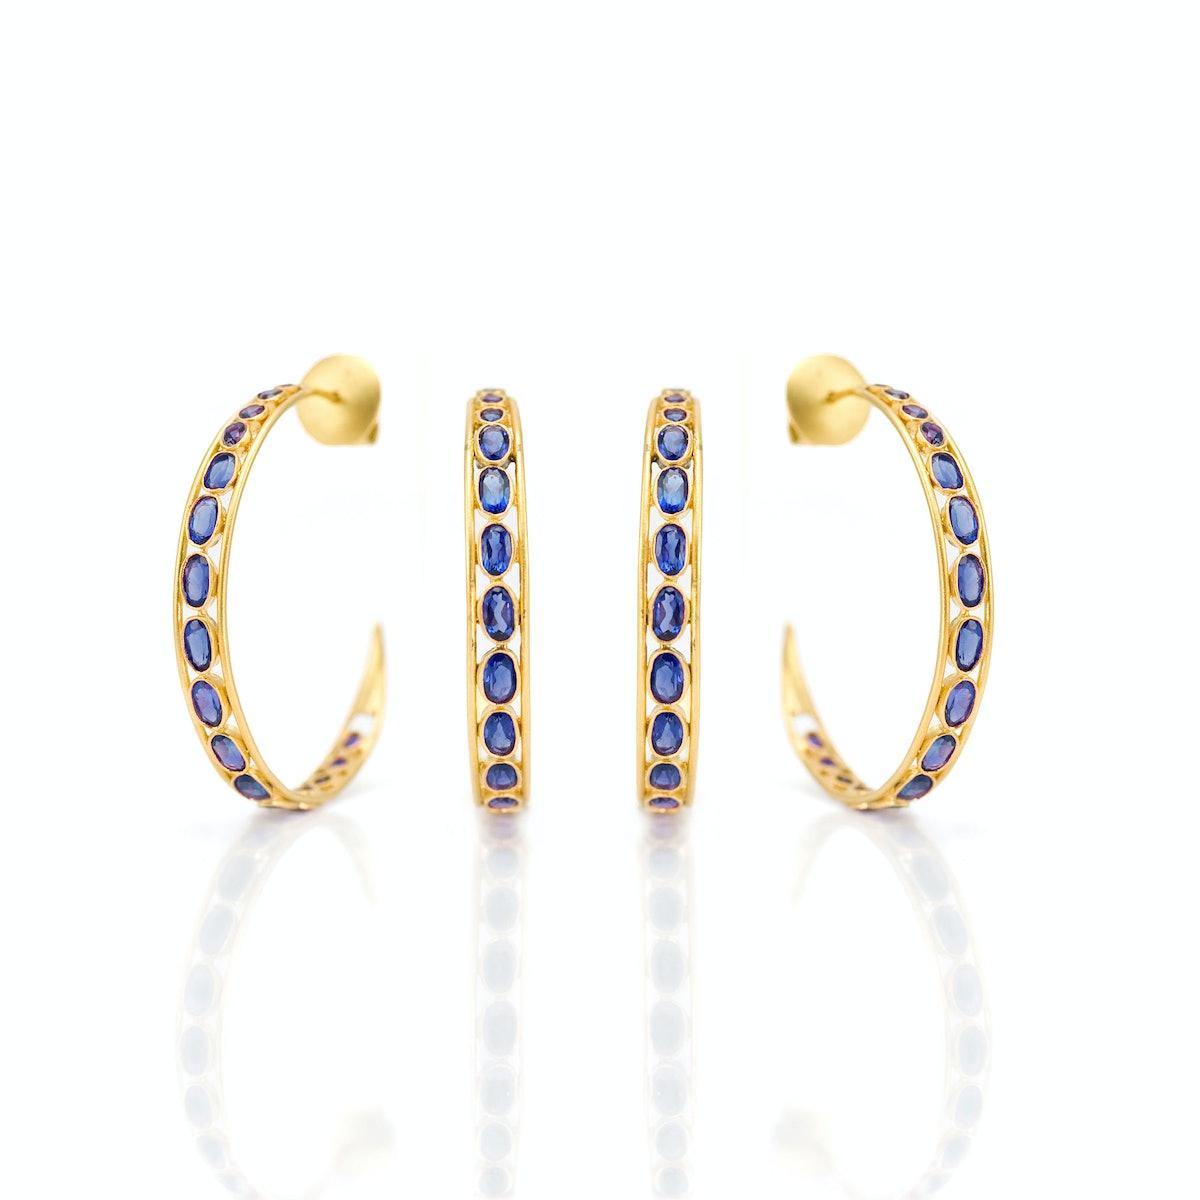 Lauren Harper Collection 18k gold and blue sapphire hoops